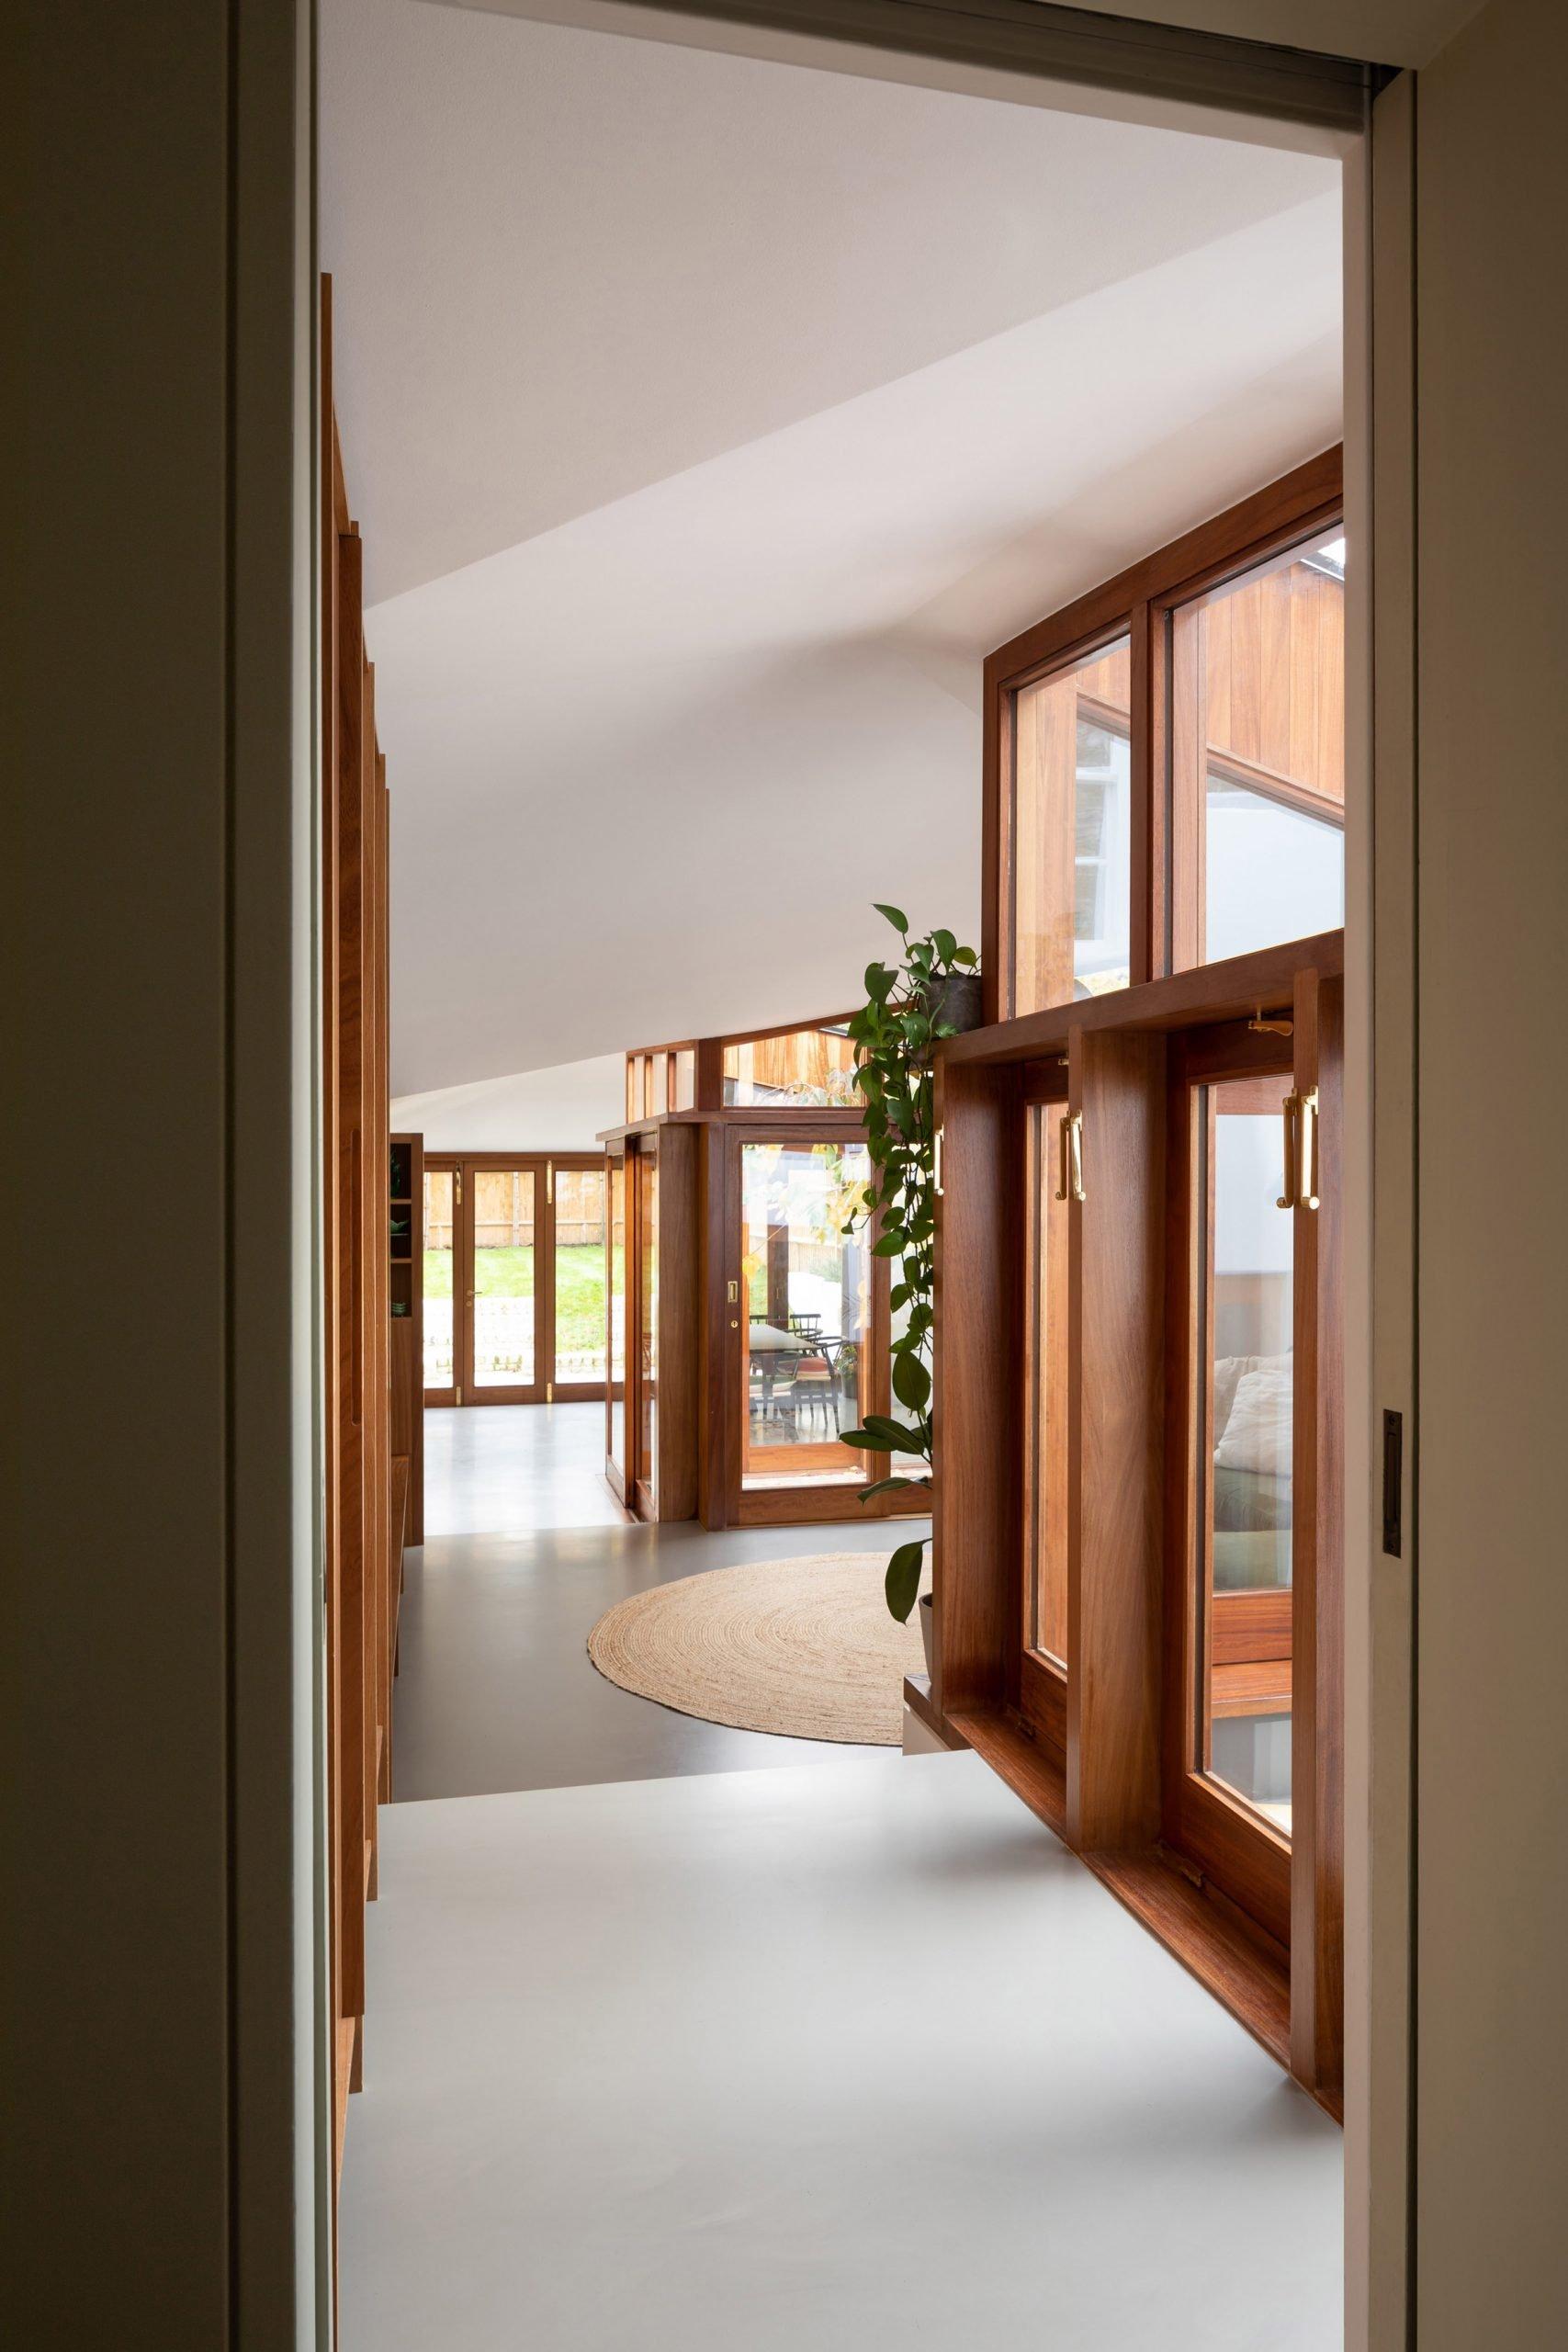 A Cloistered House's hallway with dark wood windows and doors